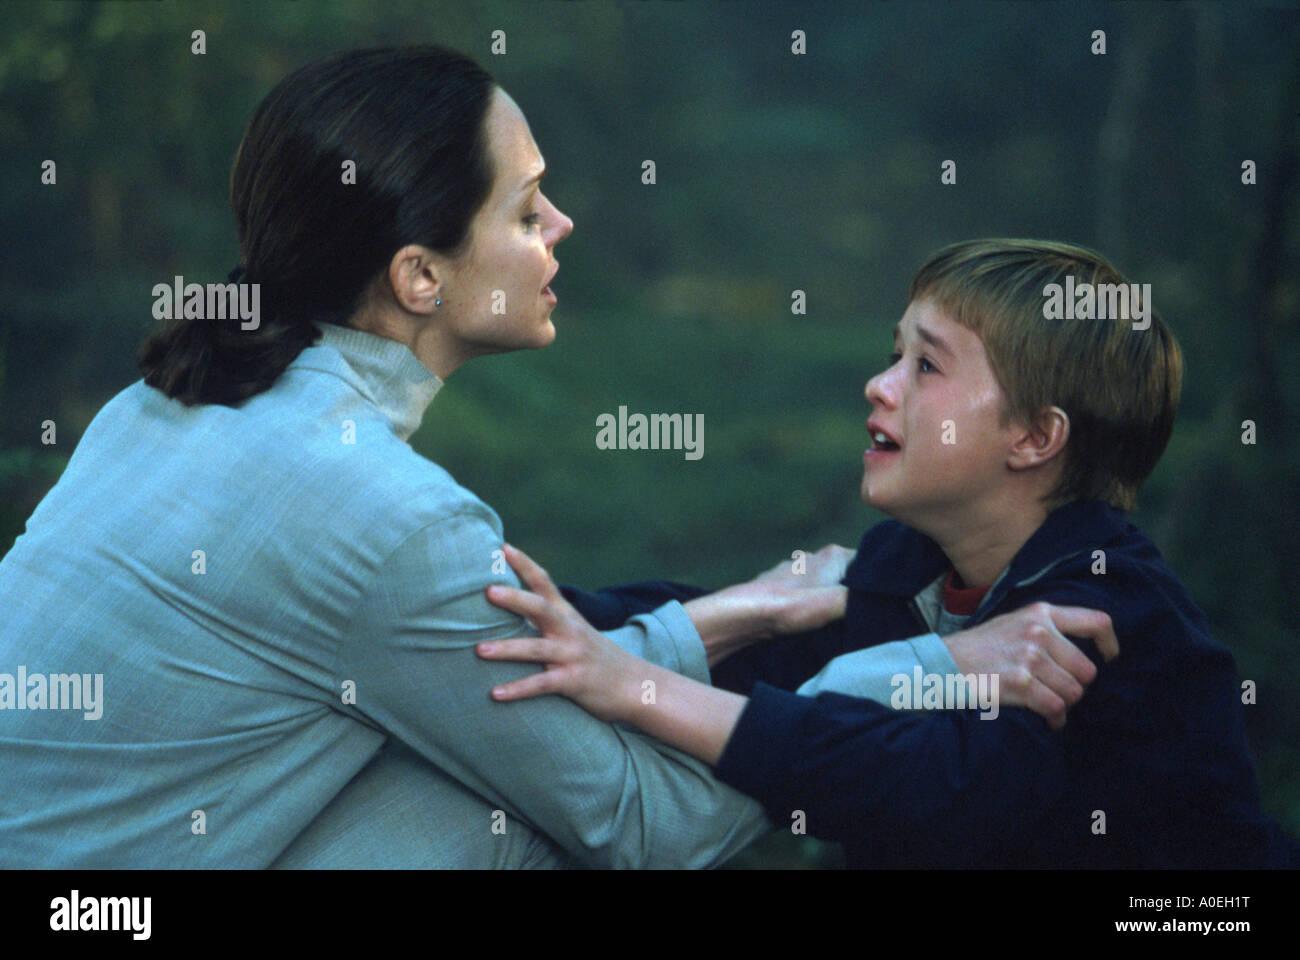 A I Artificial Intelligence 2001 Warner Film With Haley Joel Osmond Stock Photo Alamy